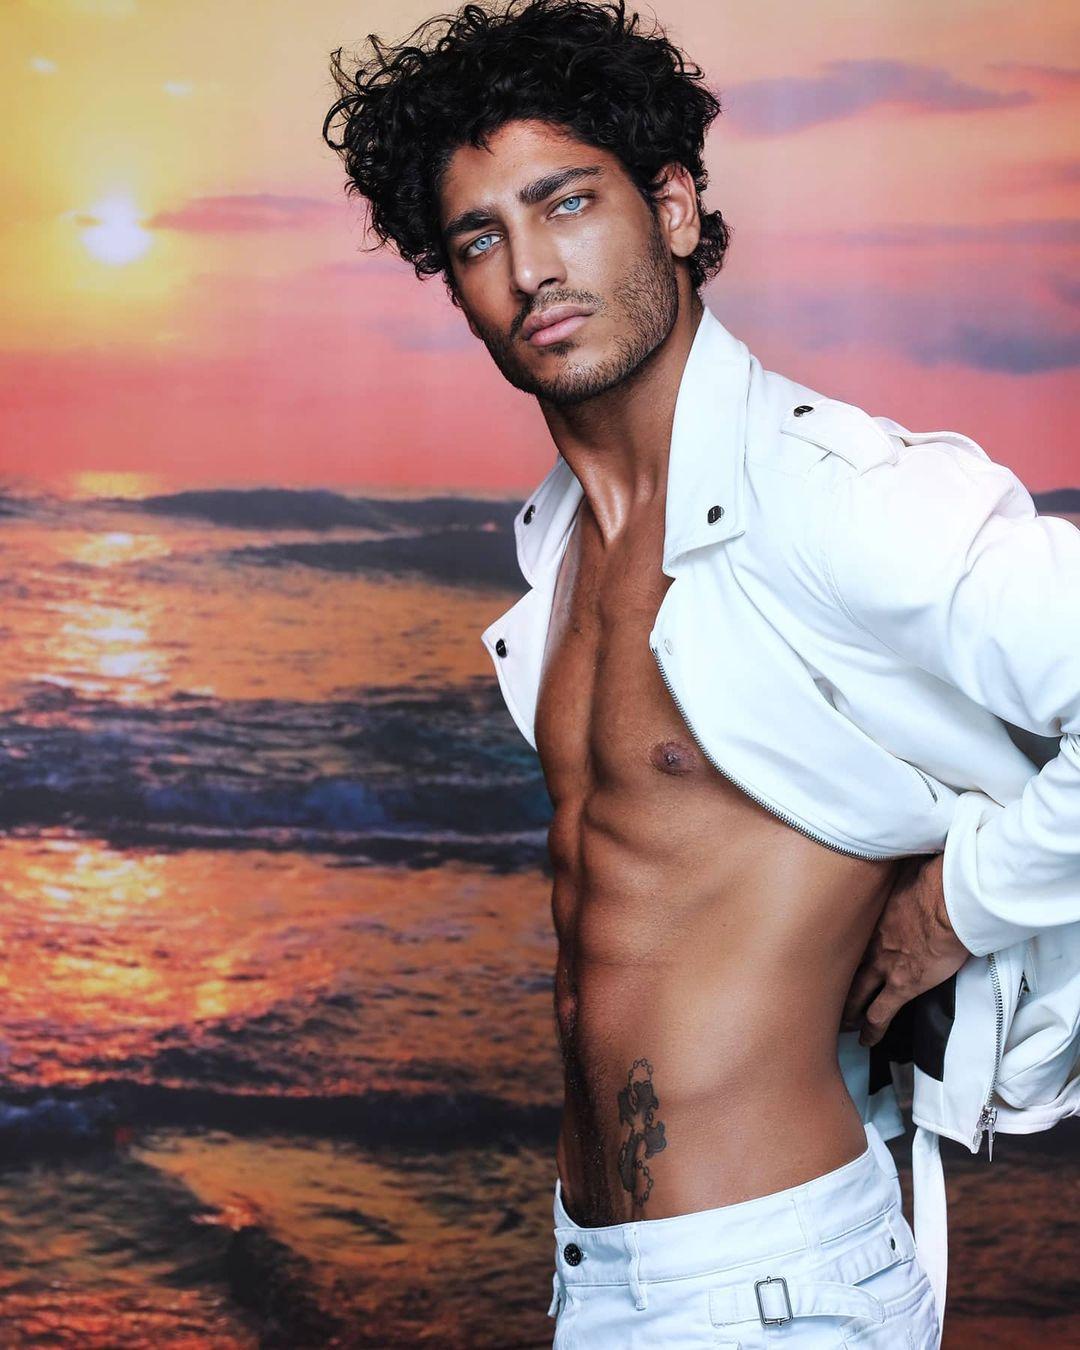 Akash Kumar, intervista esclusiva: l'Isola, la moda, l'amore